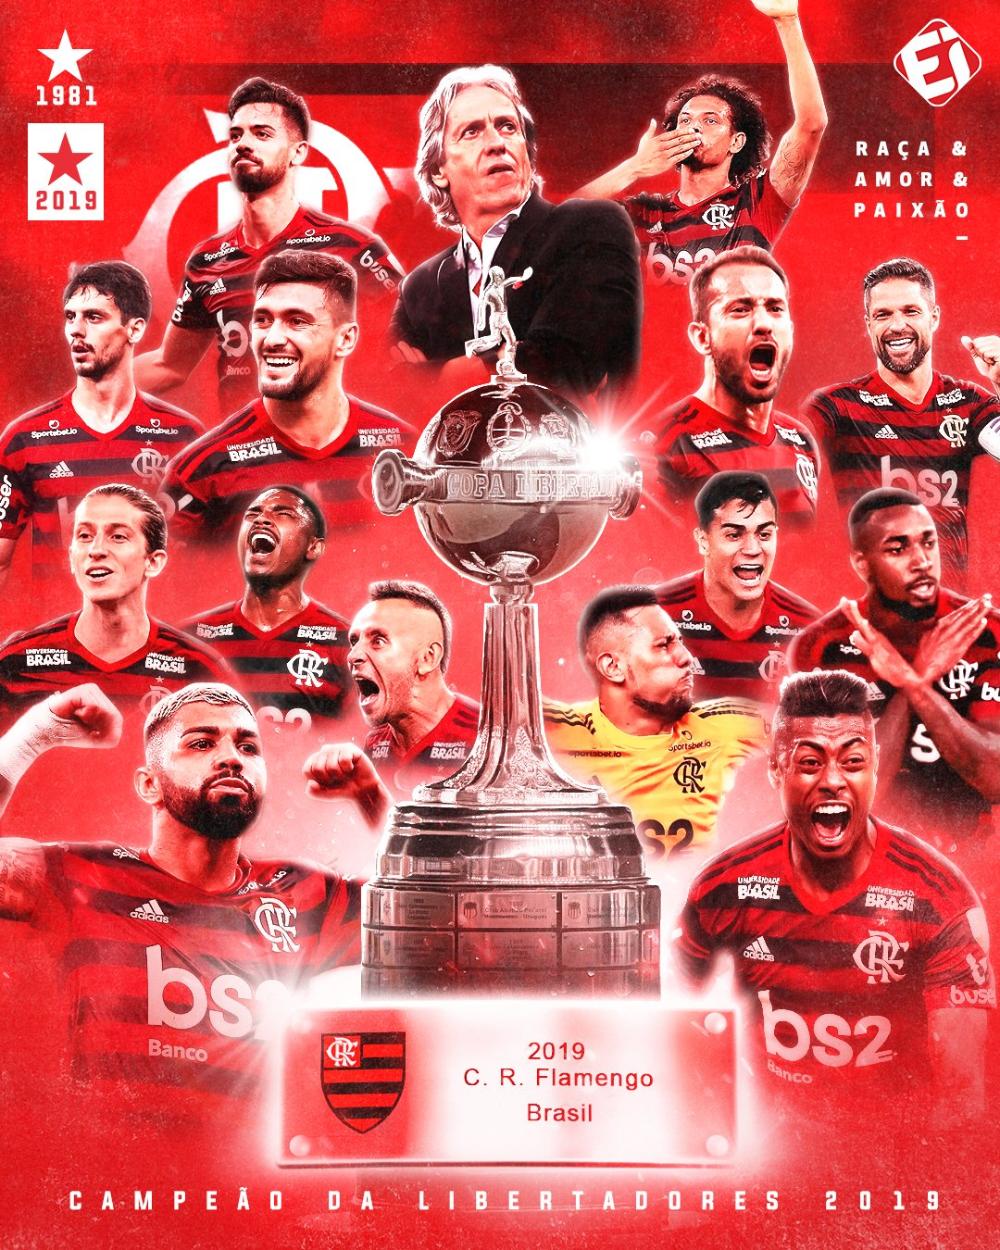 Esporte Interativo (de 🏠) on Twitter Movie posters